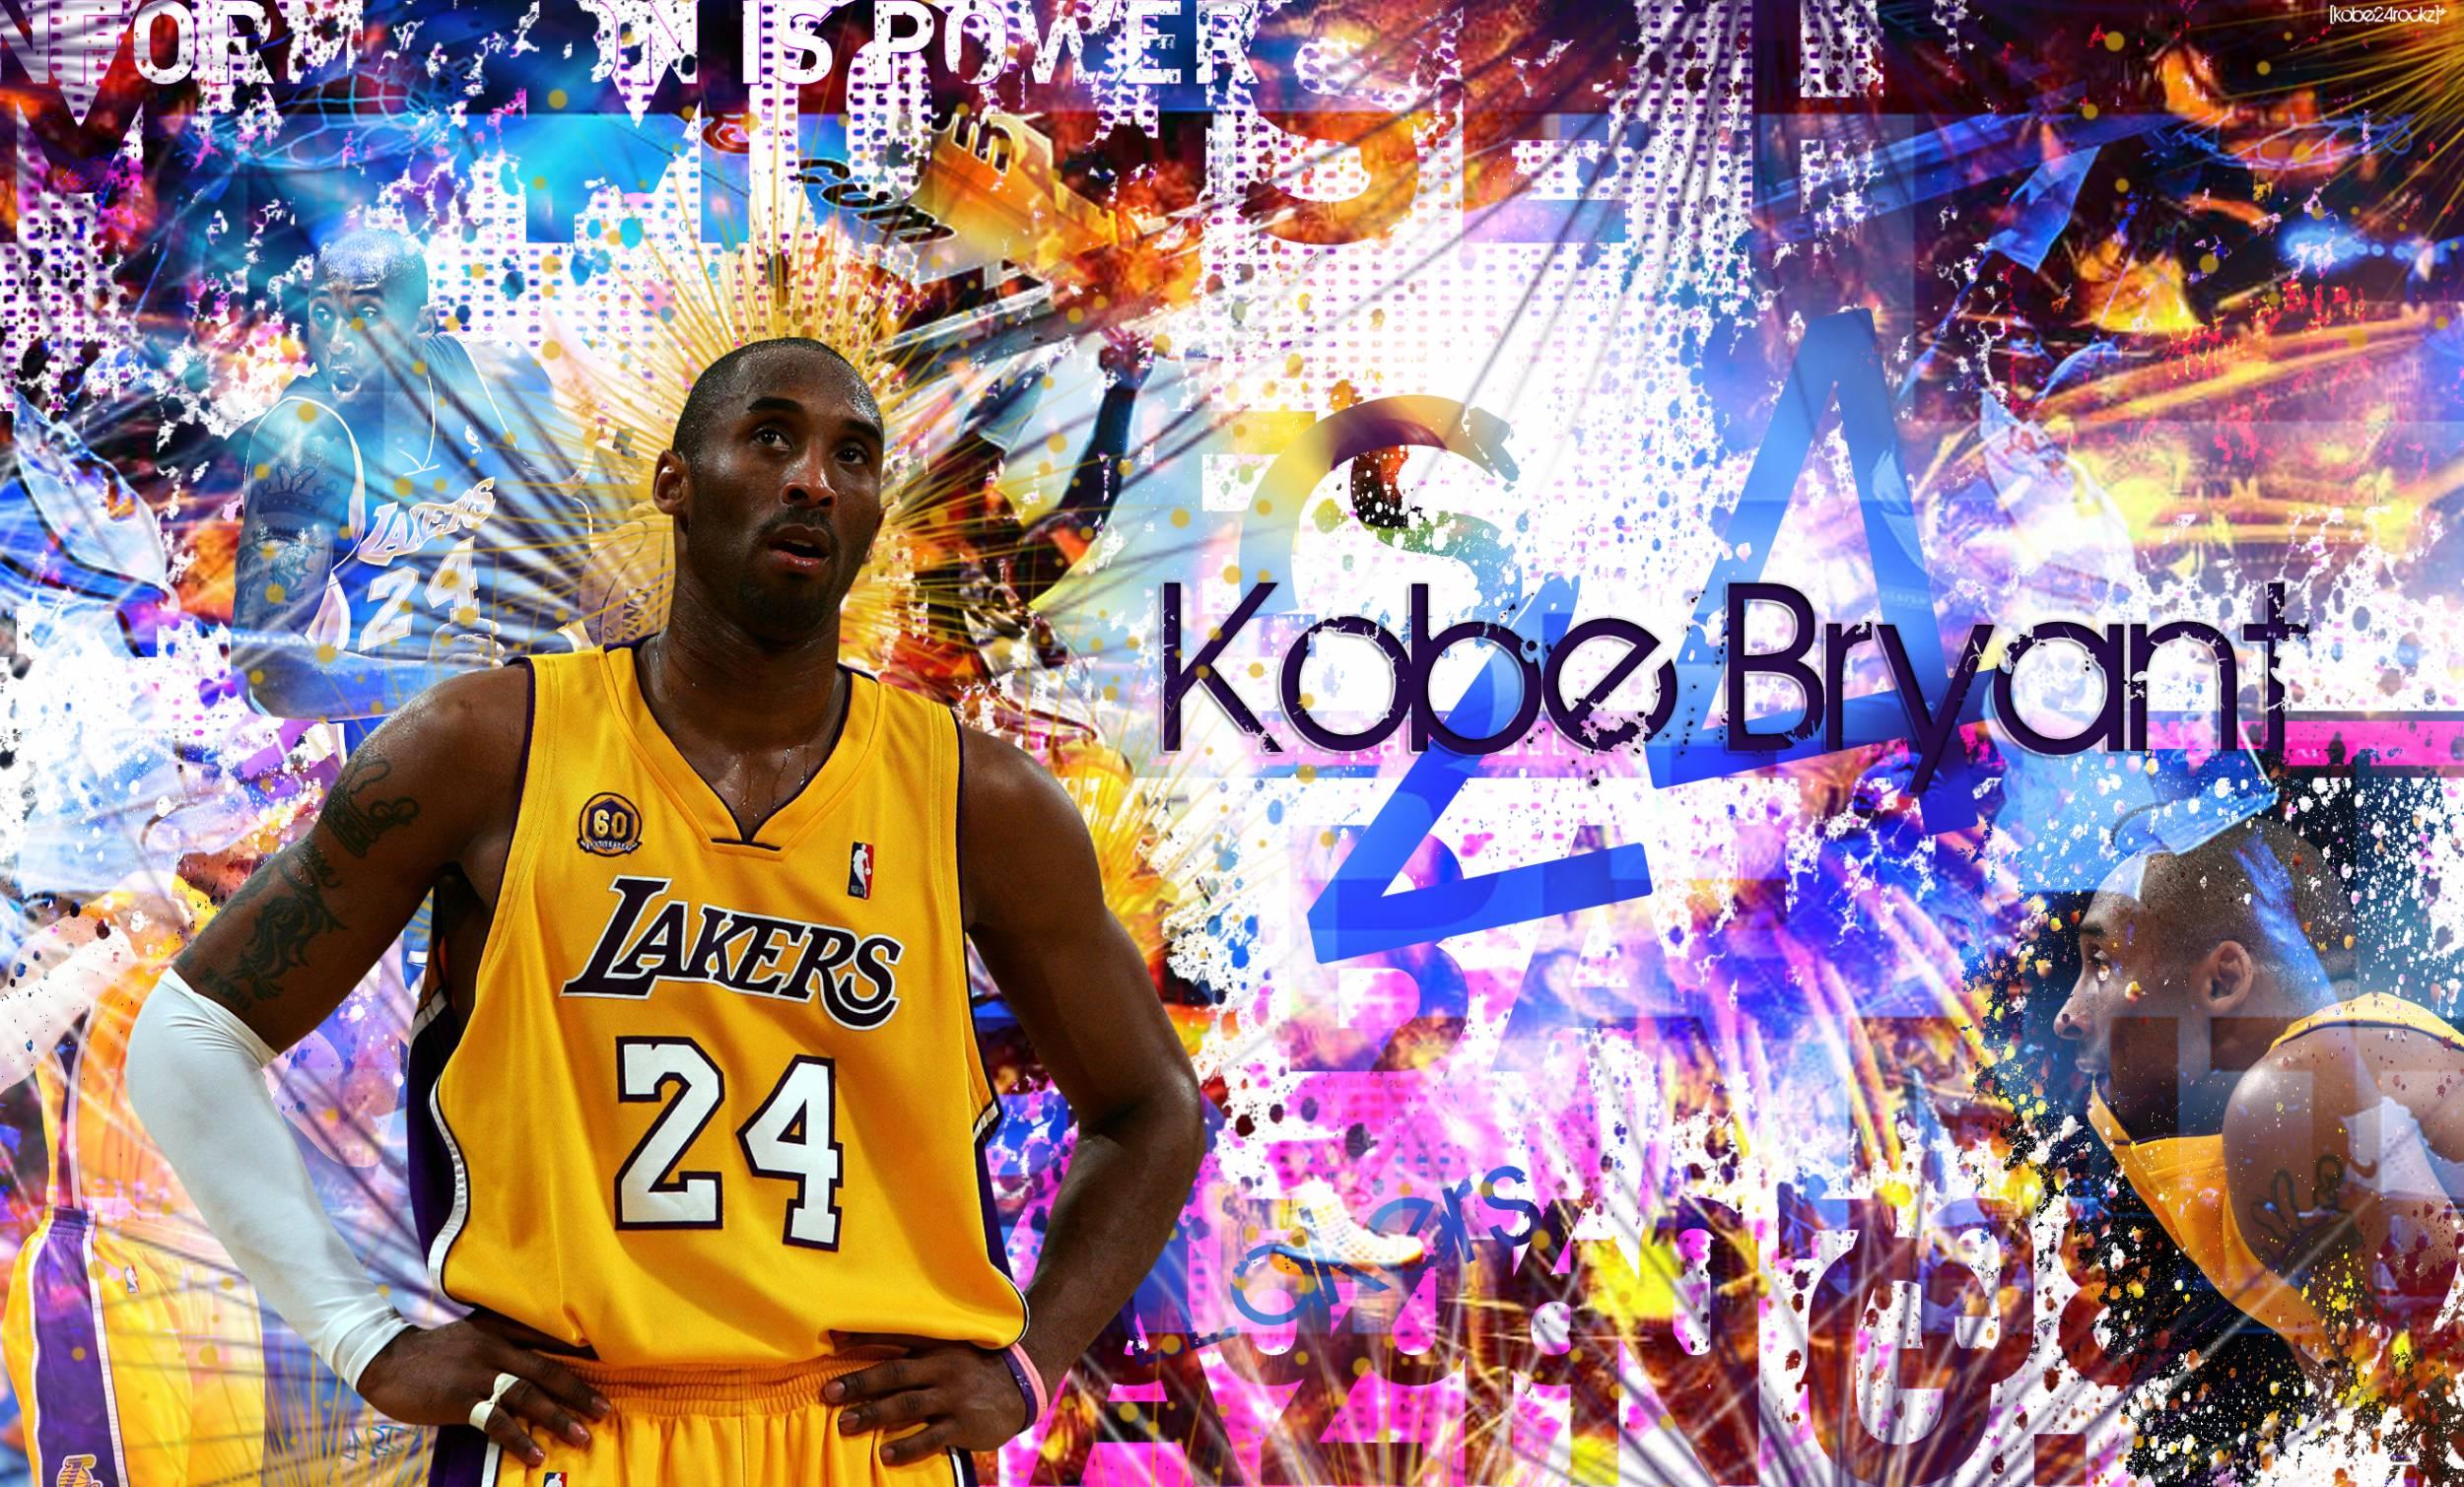 Cool Wallpapers Of Kobe Bryant   2500x1509 Wallpaper   teahubio 2500x1509